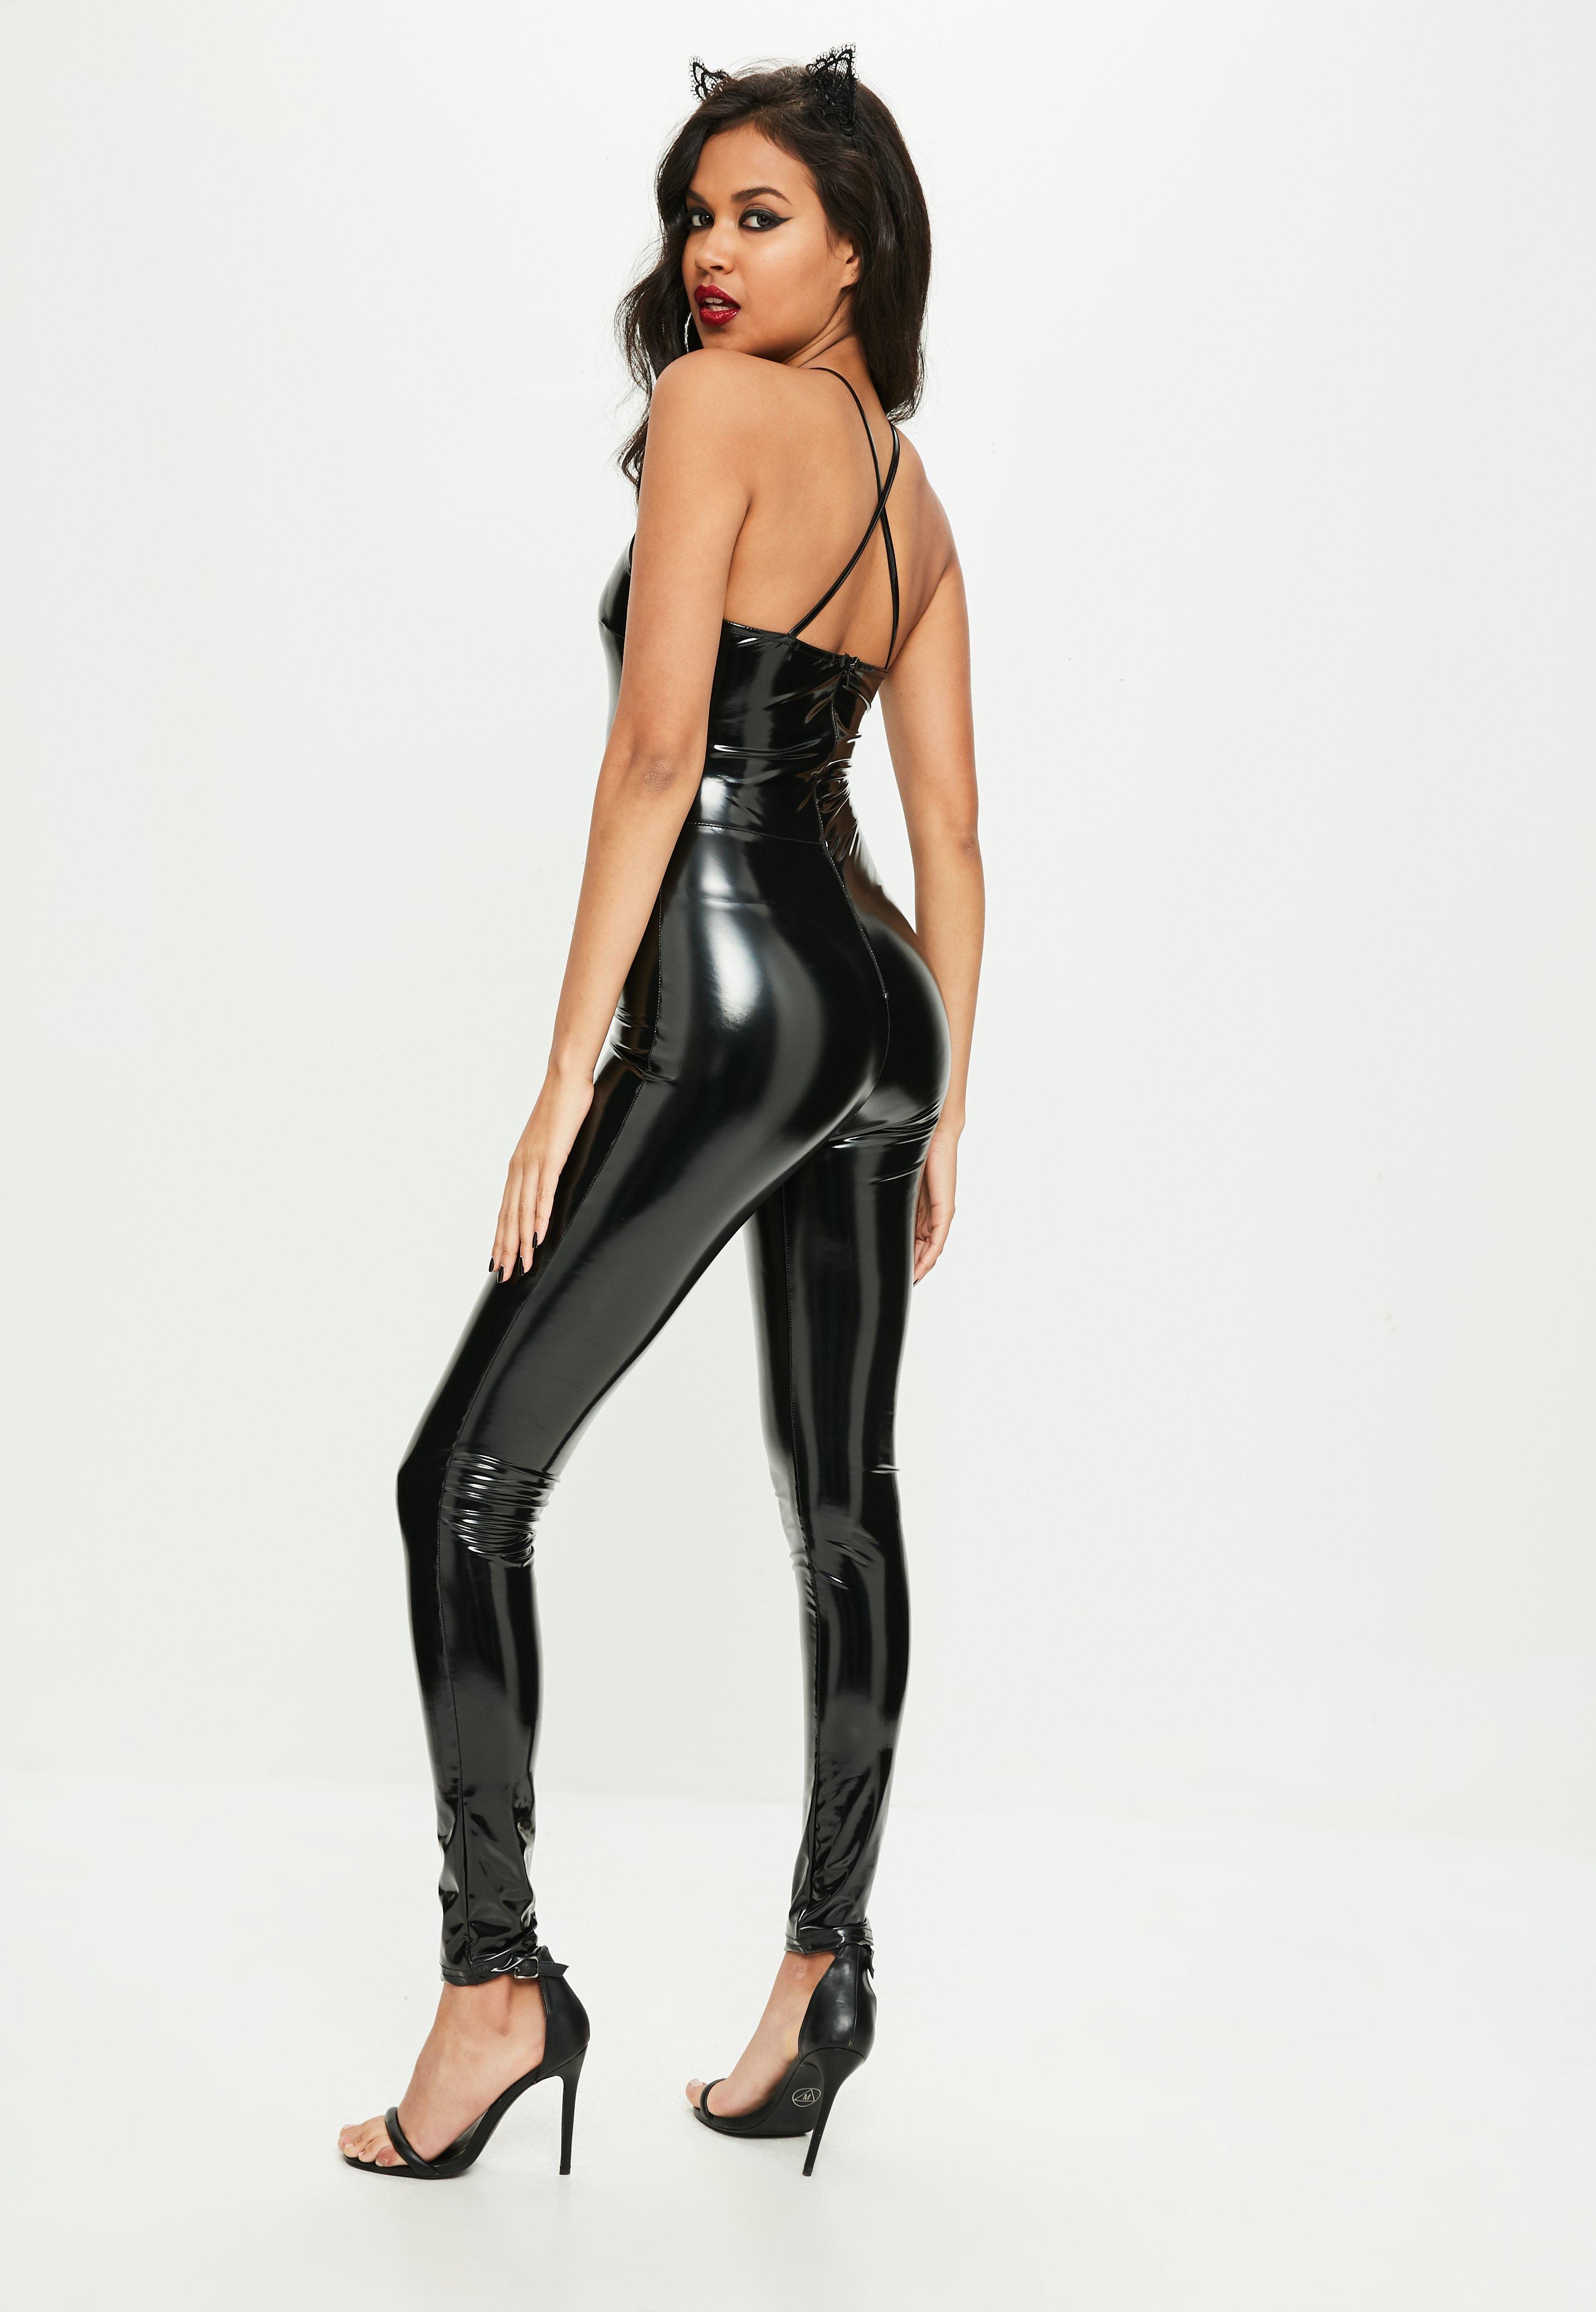 lyst - missguided halloween black 90s neck vinyl jumpsuit in black